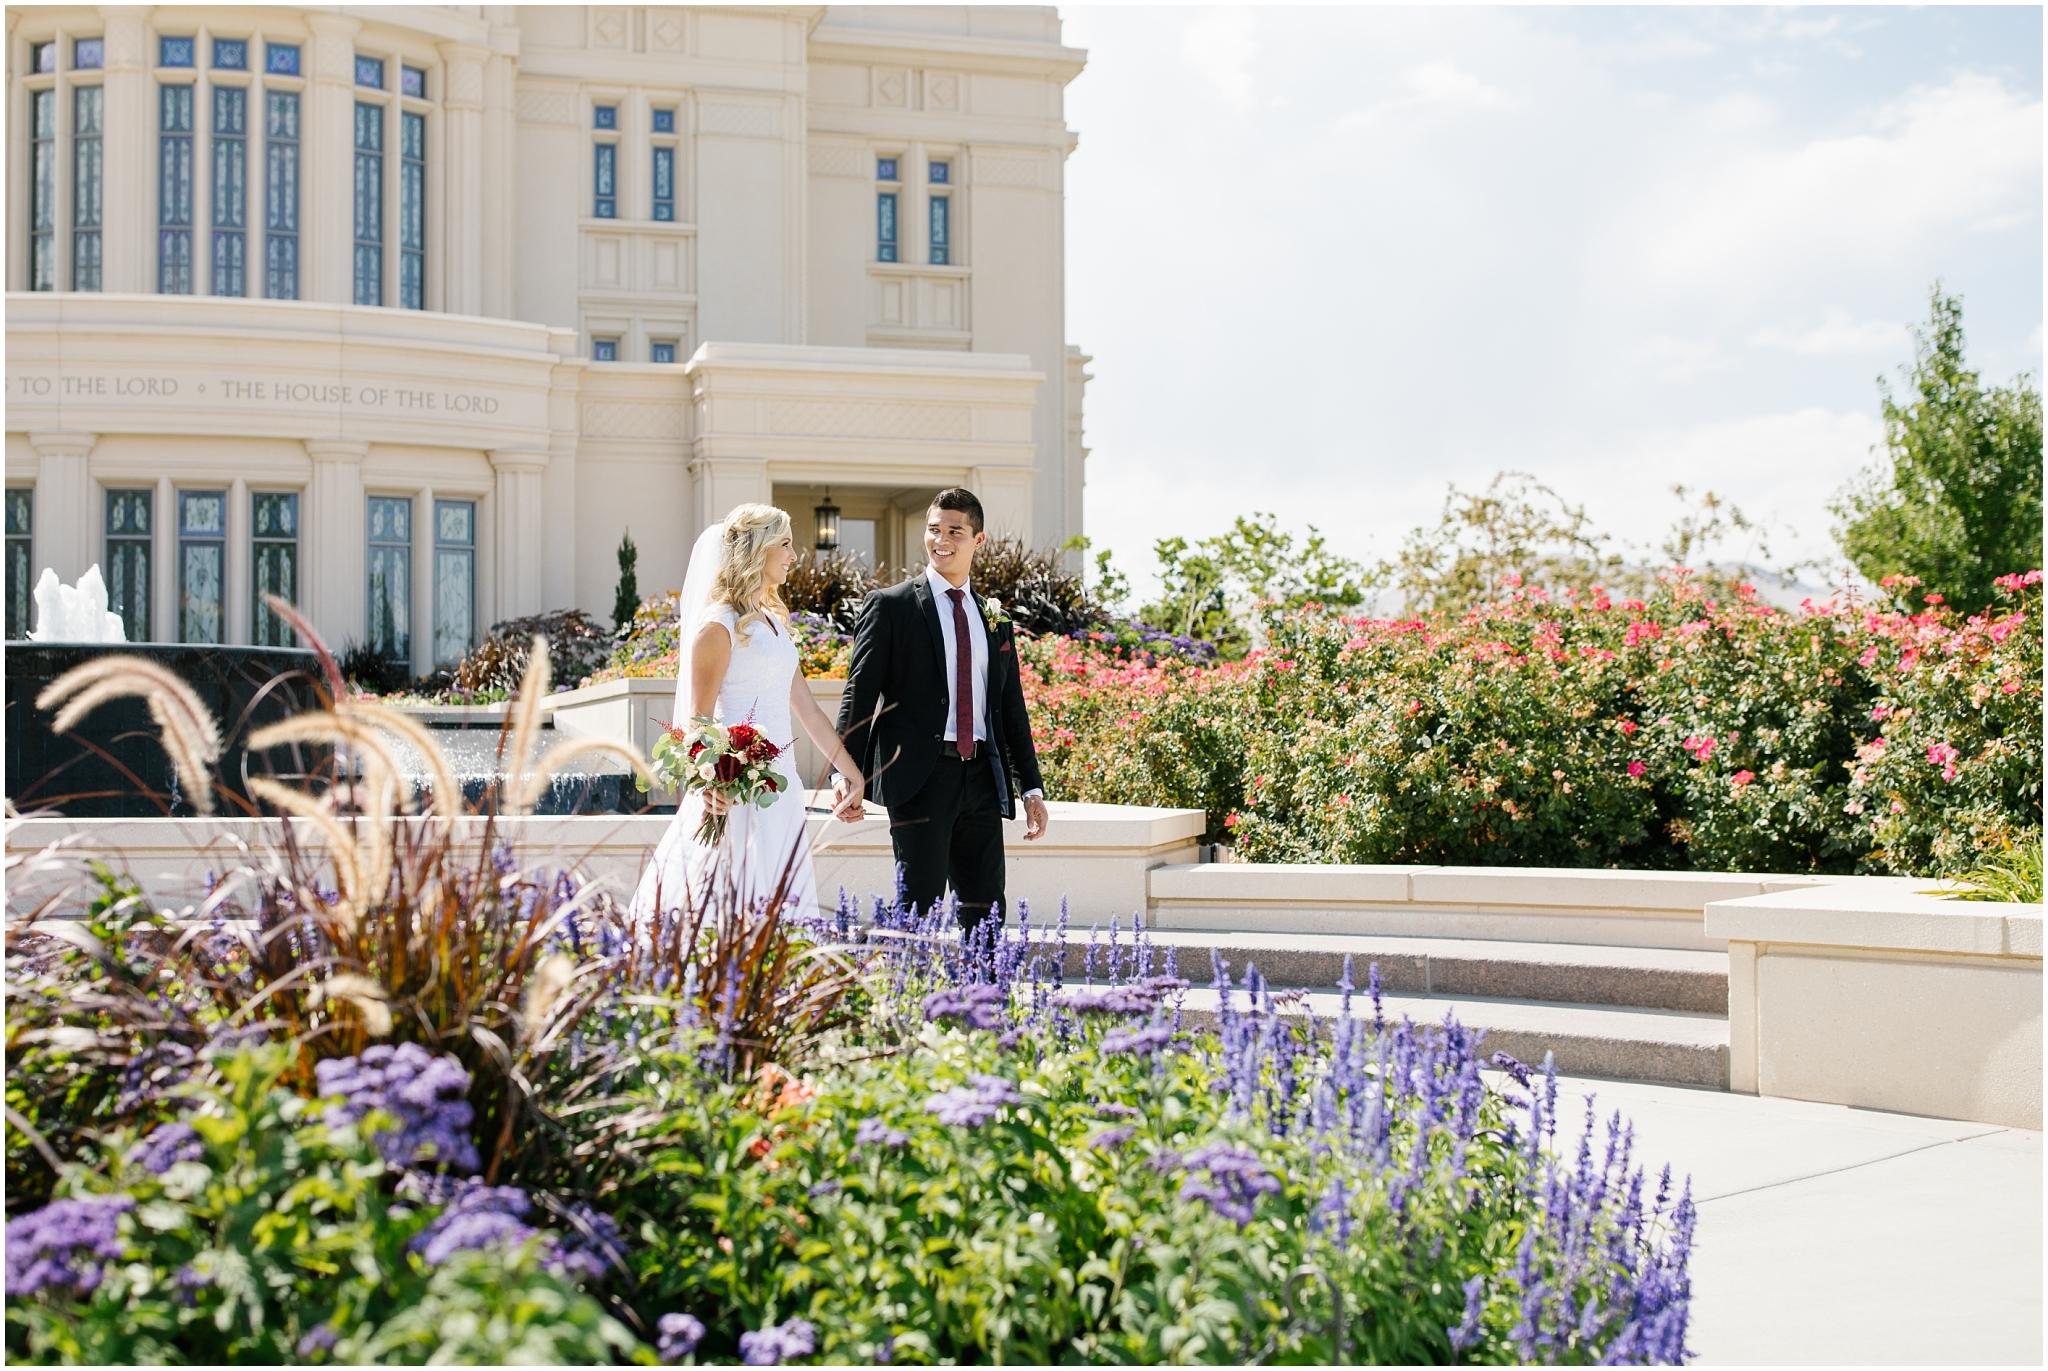 HannahChaseWedding-198_Lizzie-B-Imagery-Utah-Wedding-Photographer-Park-City-Salt-Lake-City-Payson-Temple-Clarion-Garden-Center.jpg